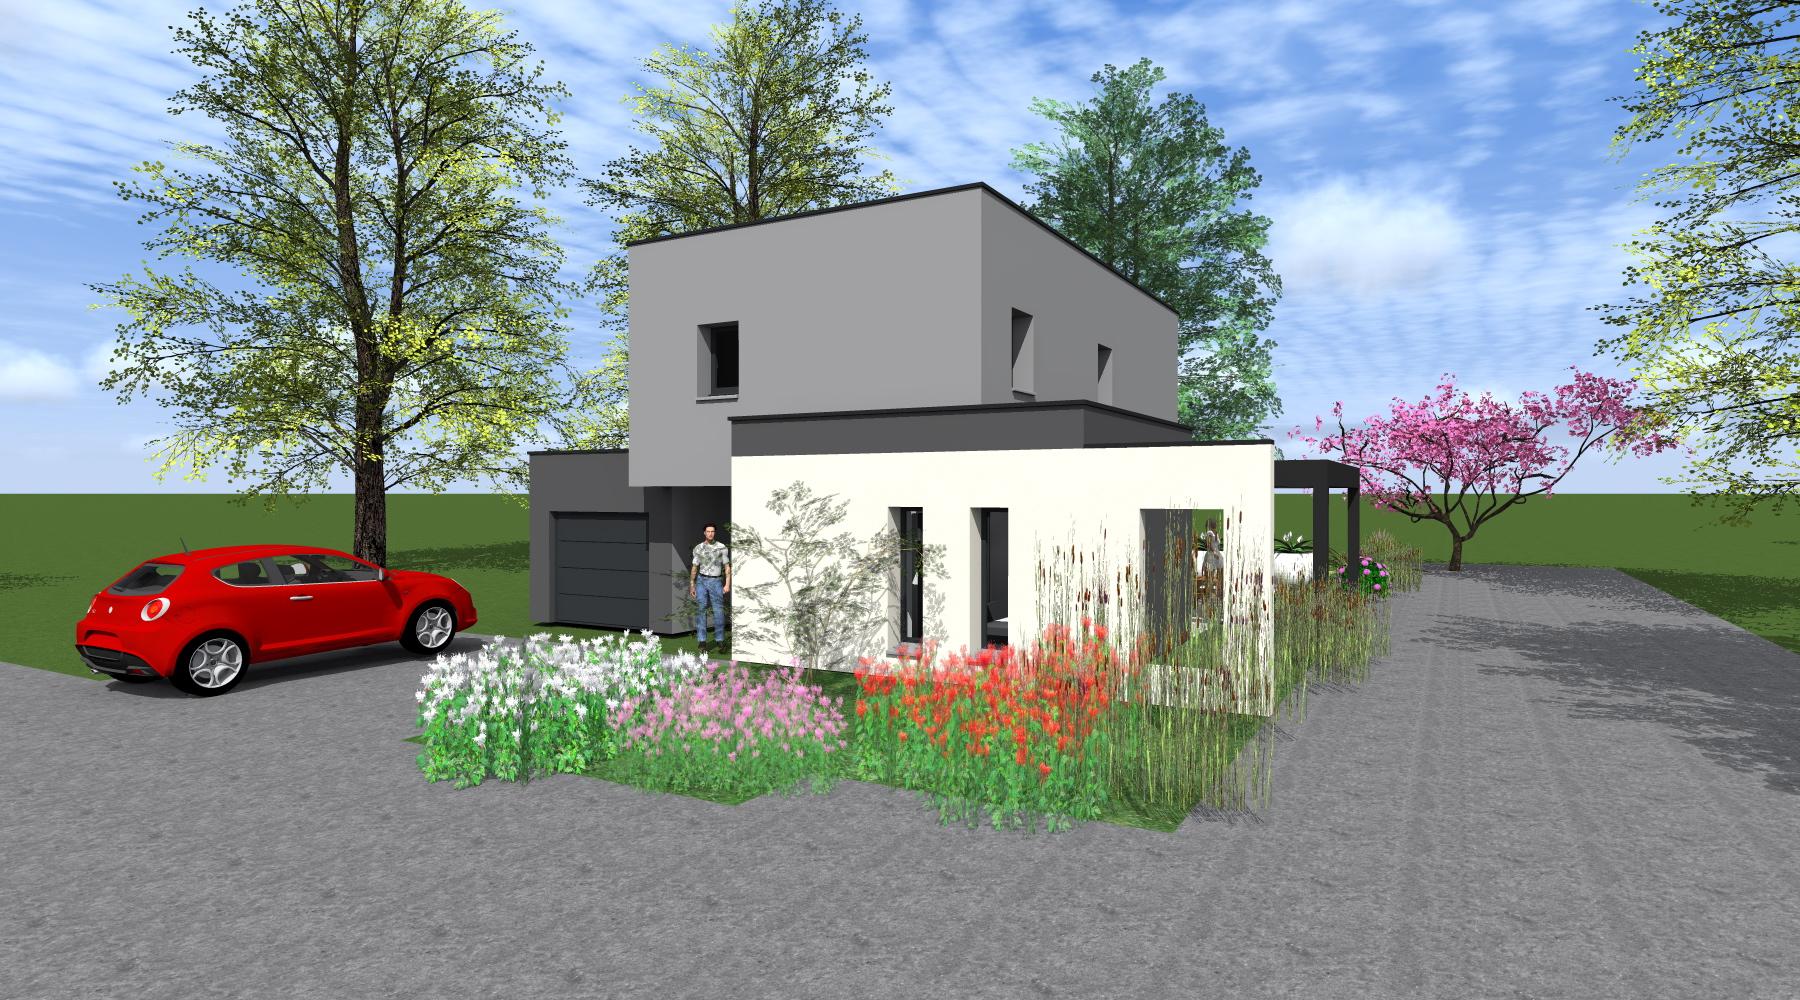 maison neuve rt 2012 1 2 vue architecte lise. Black Bedroom Furniture Sets. Home Design Ideas